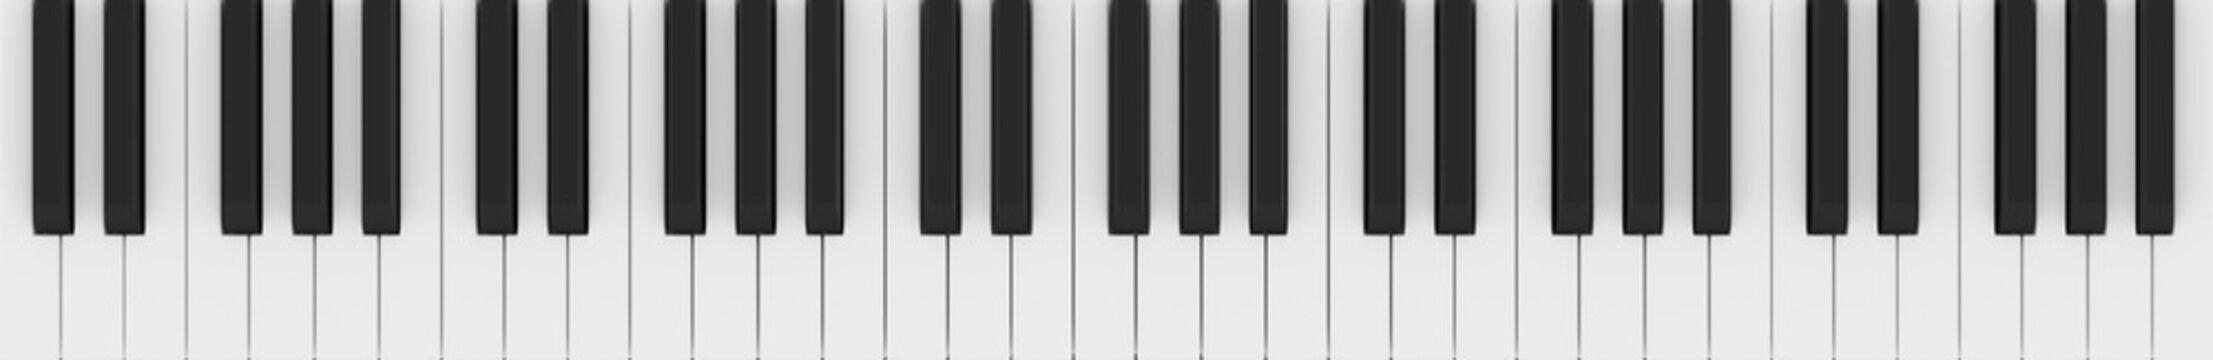 Five-Octave Piano Keys (Realistic 3d Illustration)